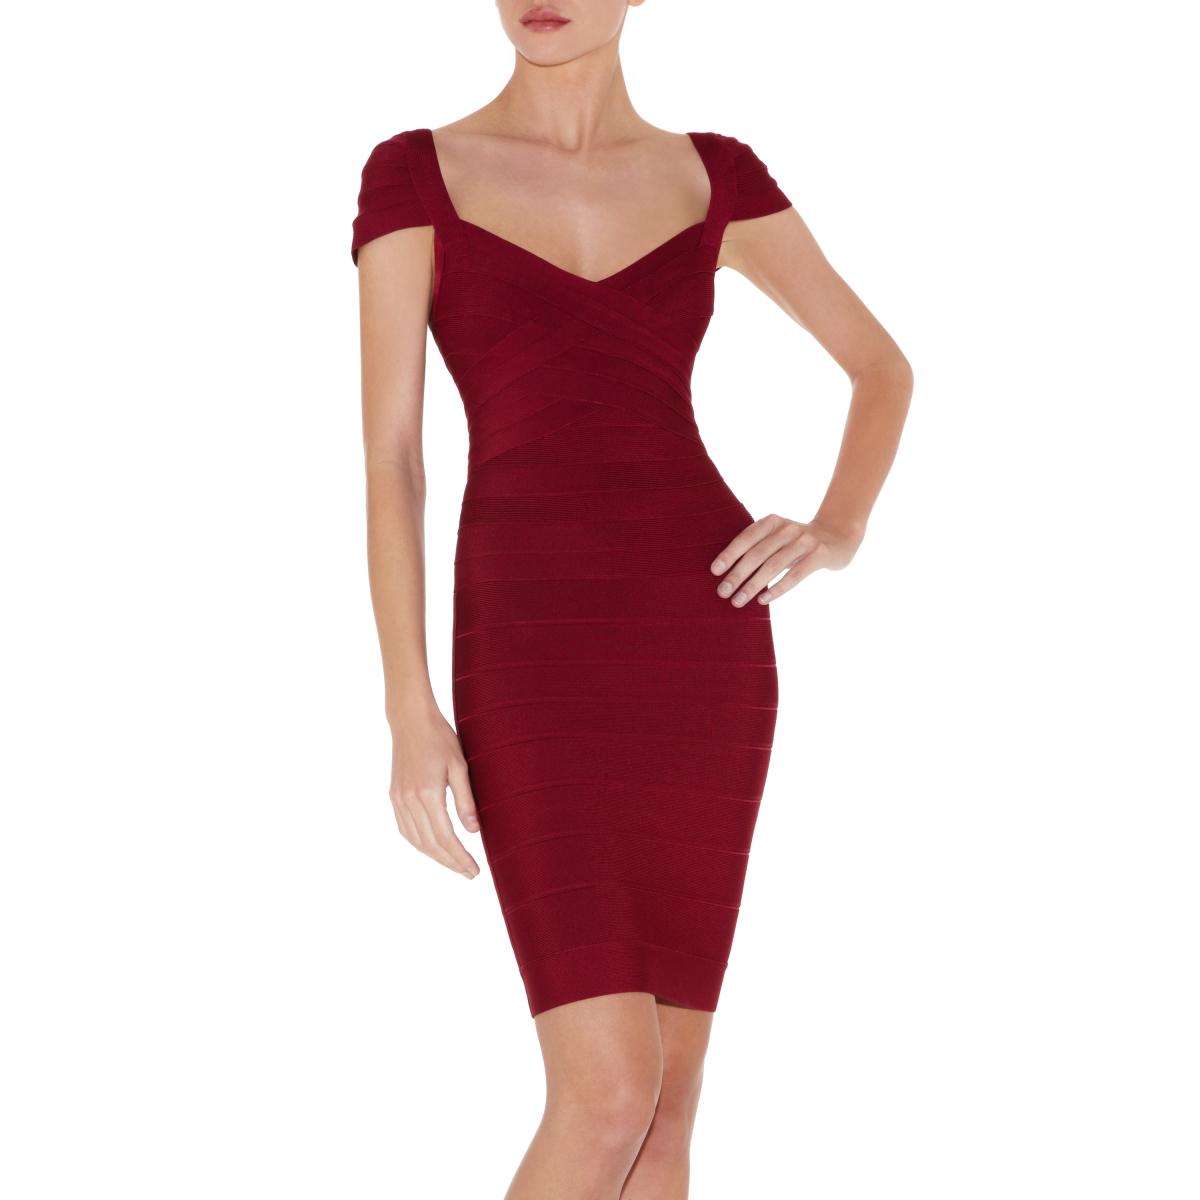 http://2.bp.blogspot.com/-njYuNbjRj8U/UDTLSXSXAQI/AAAAAAAAFXc/ziyRV_hZJgs/s1600/Herve+leger+vestido+rojo.jpg